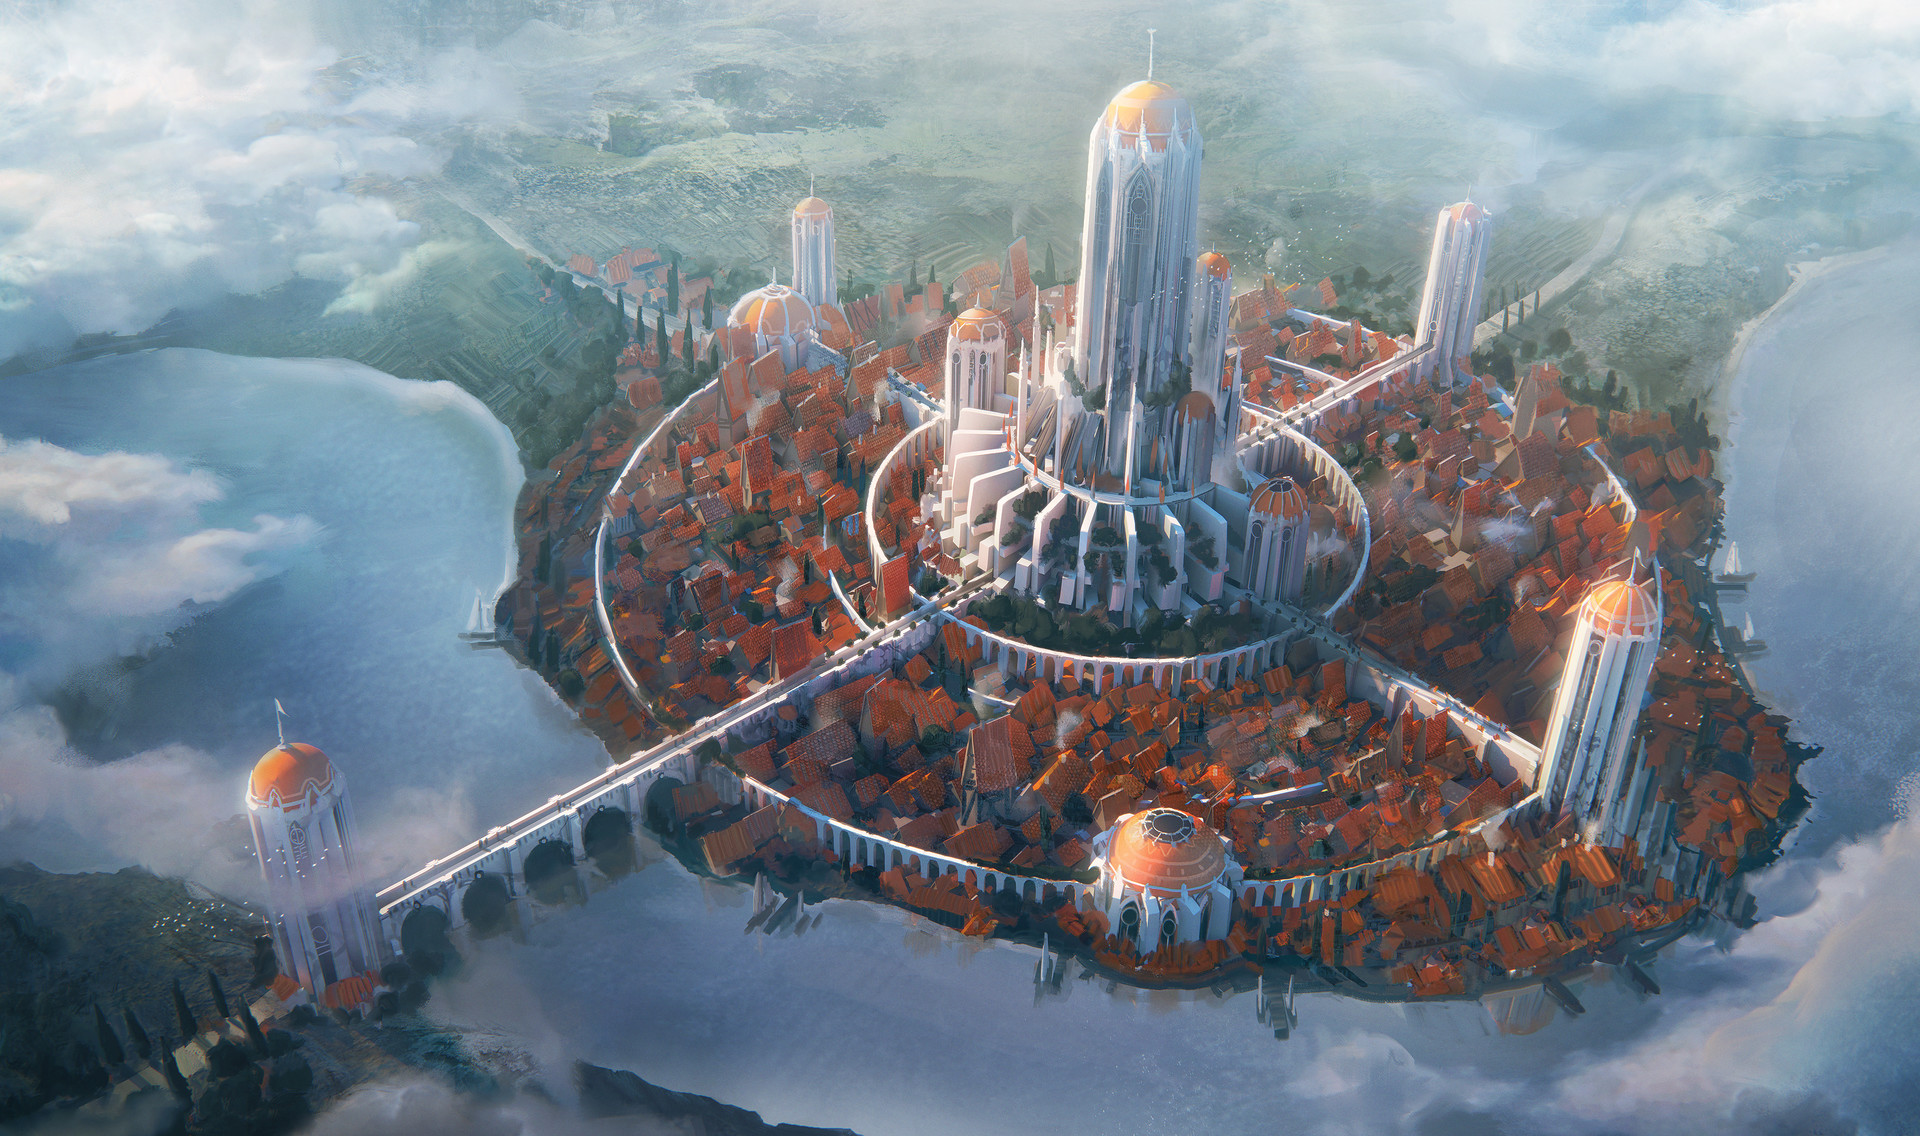 Leon tukker magic city2 as